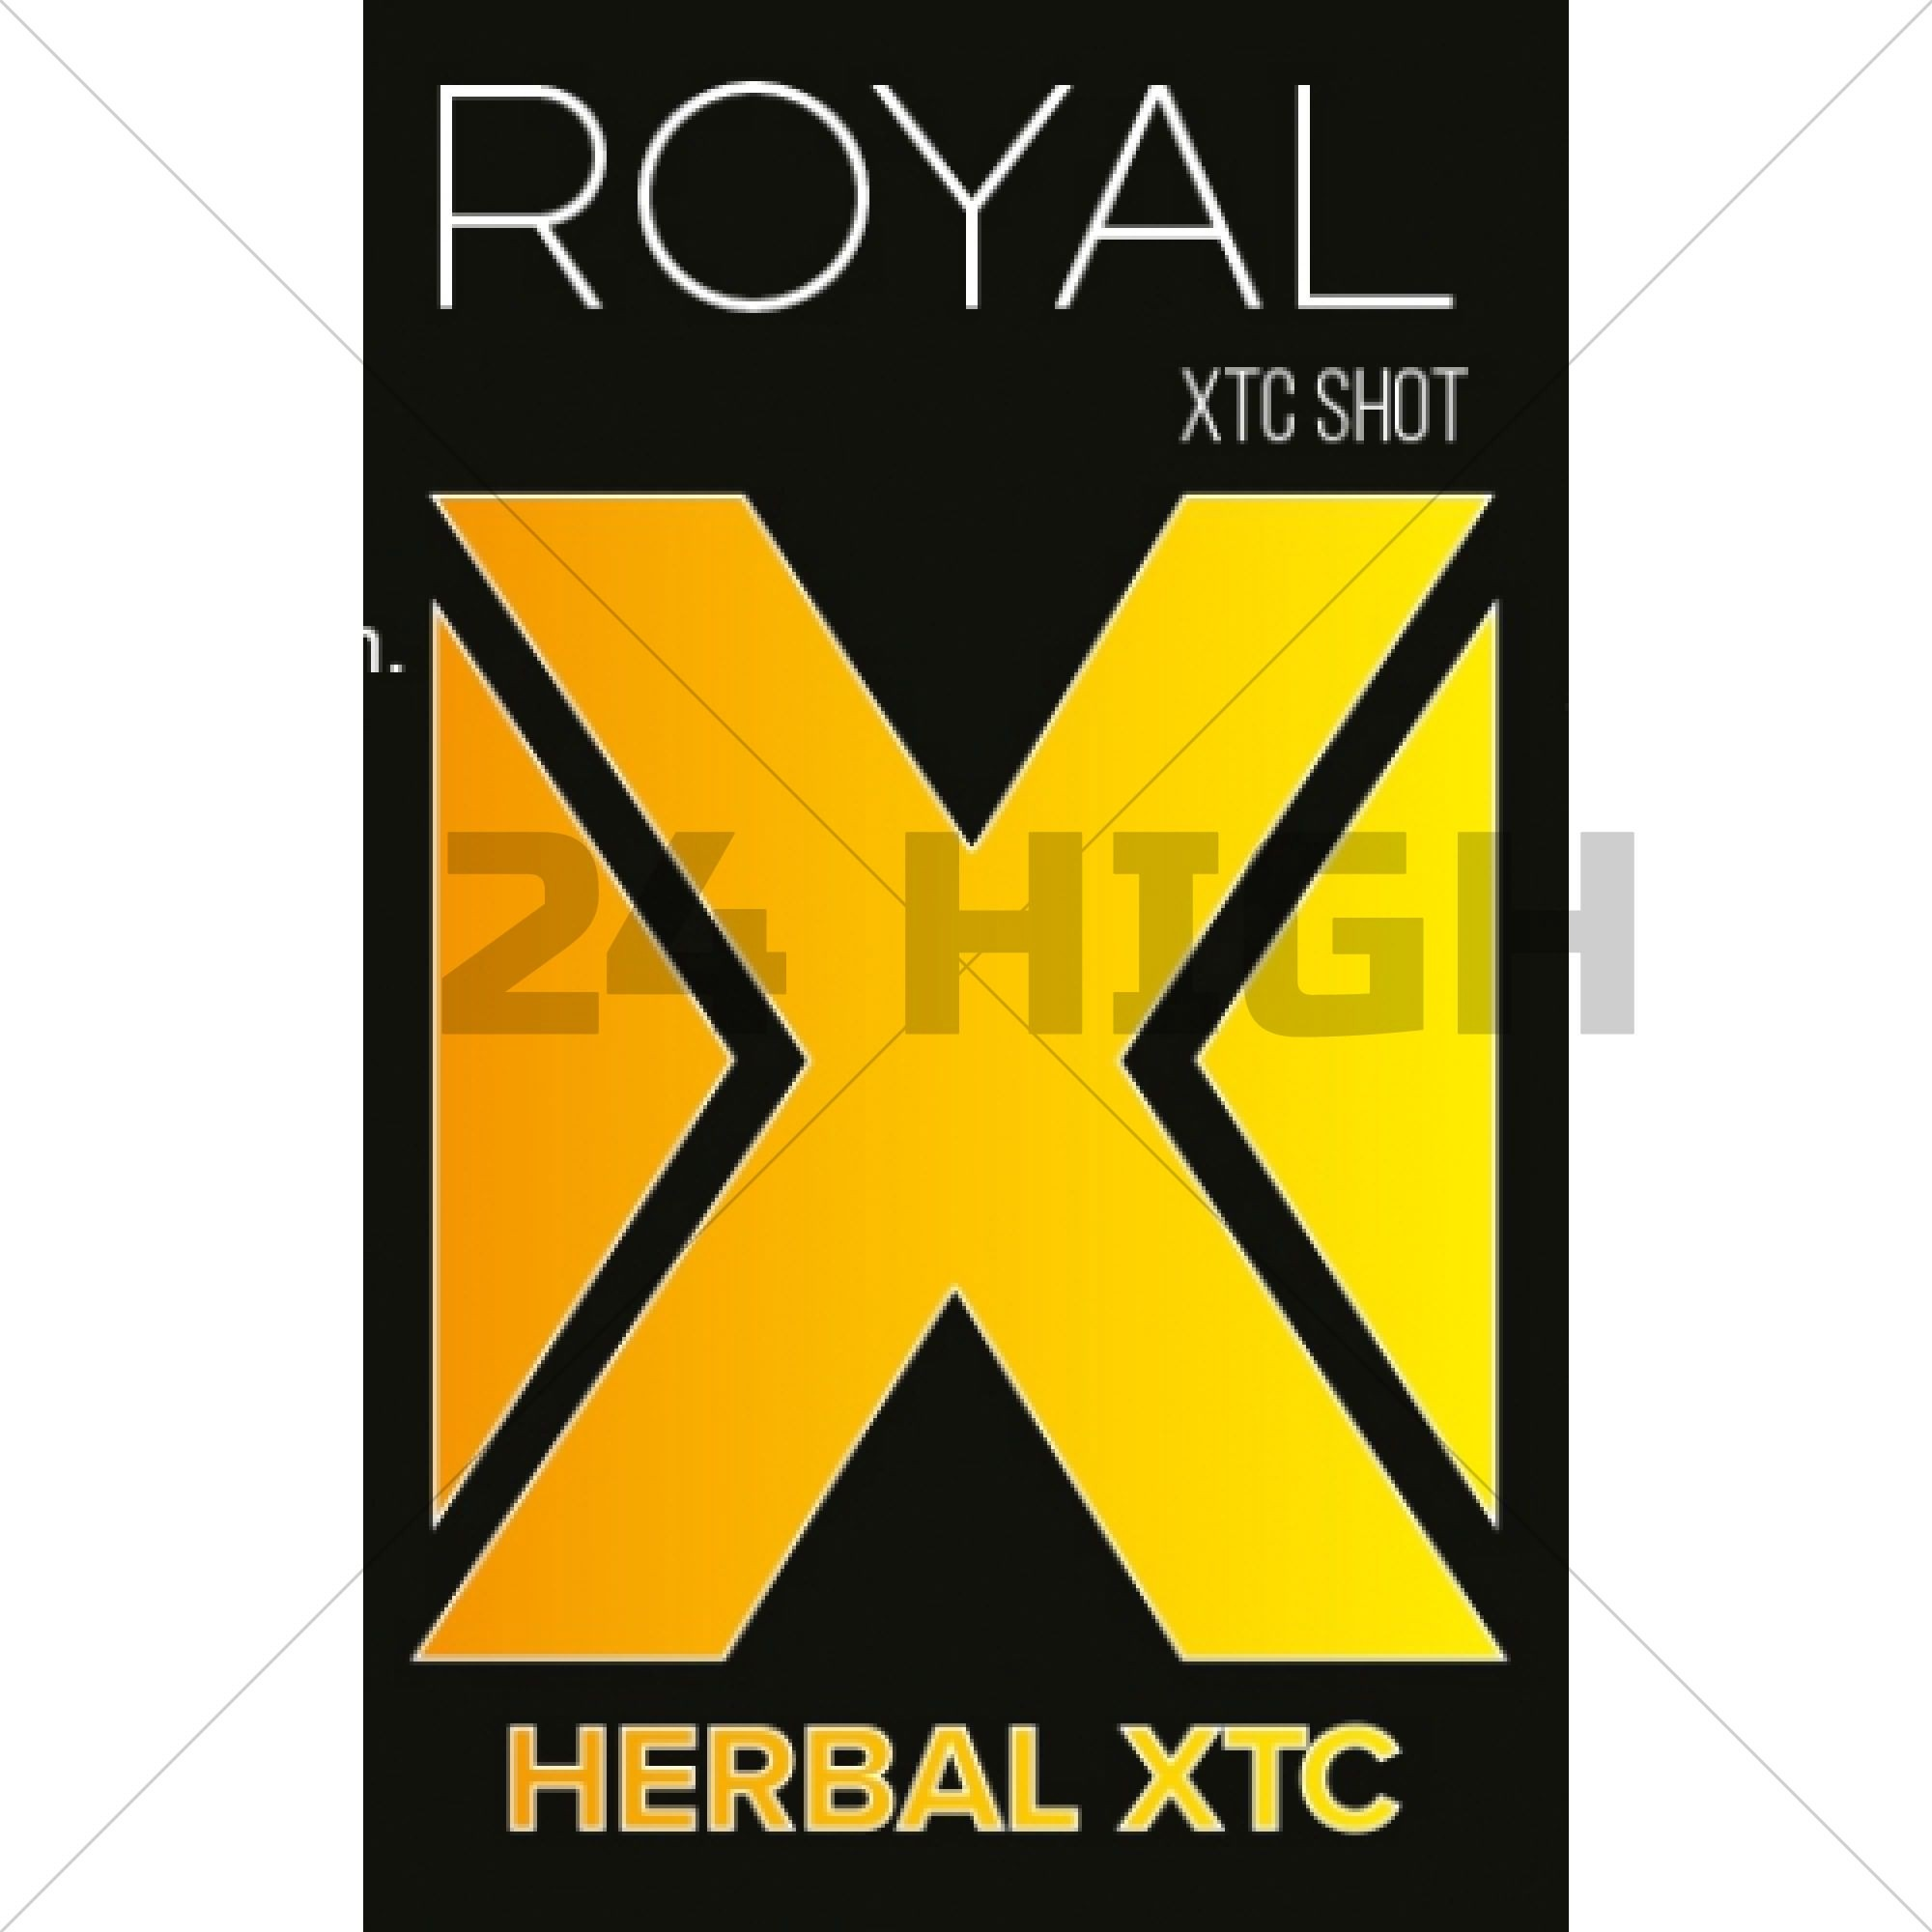 Royal Xtc